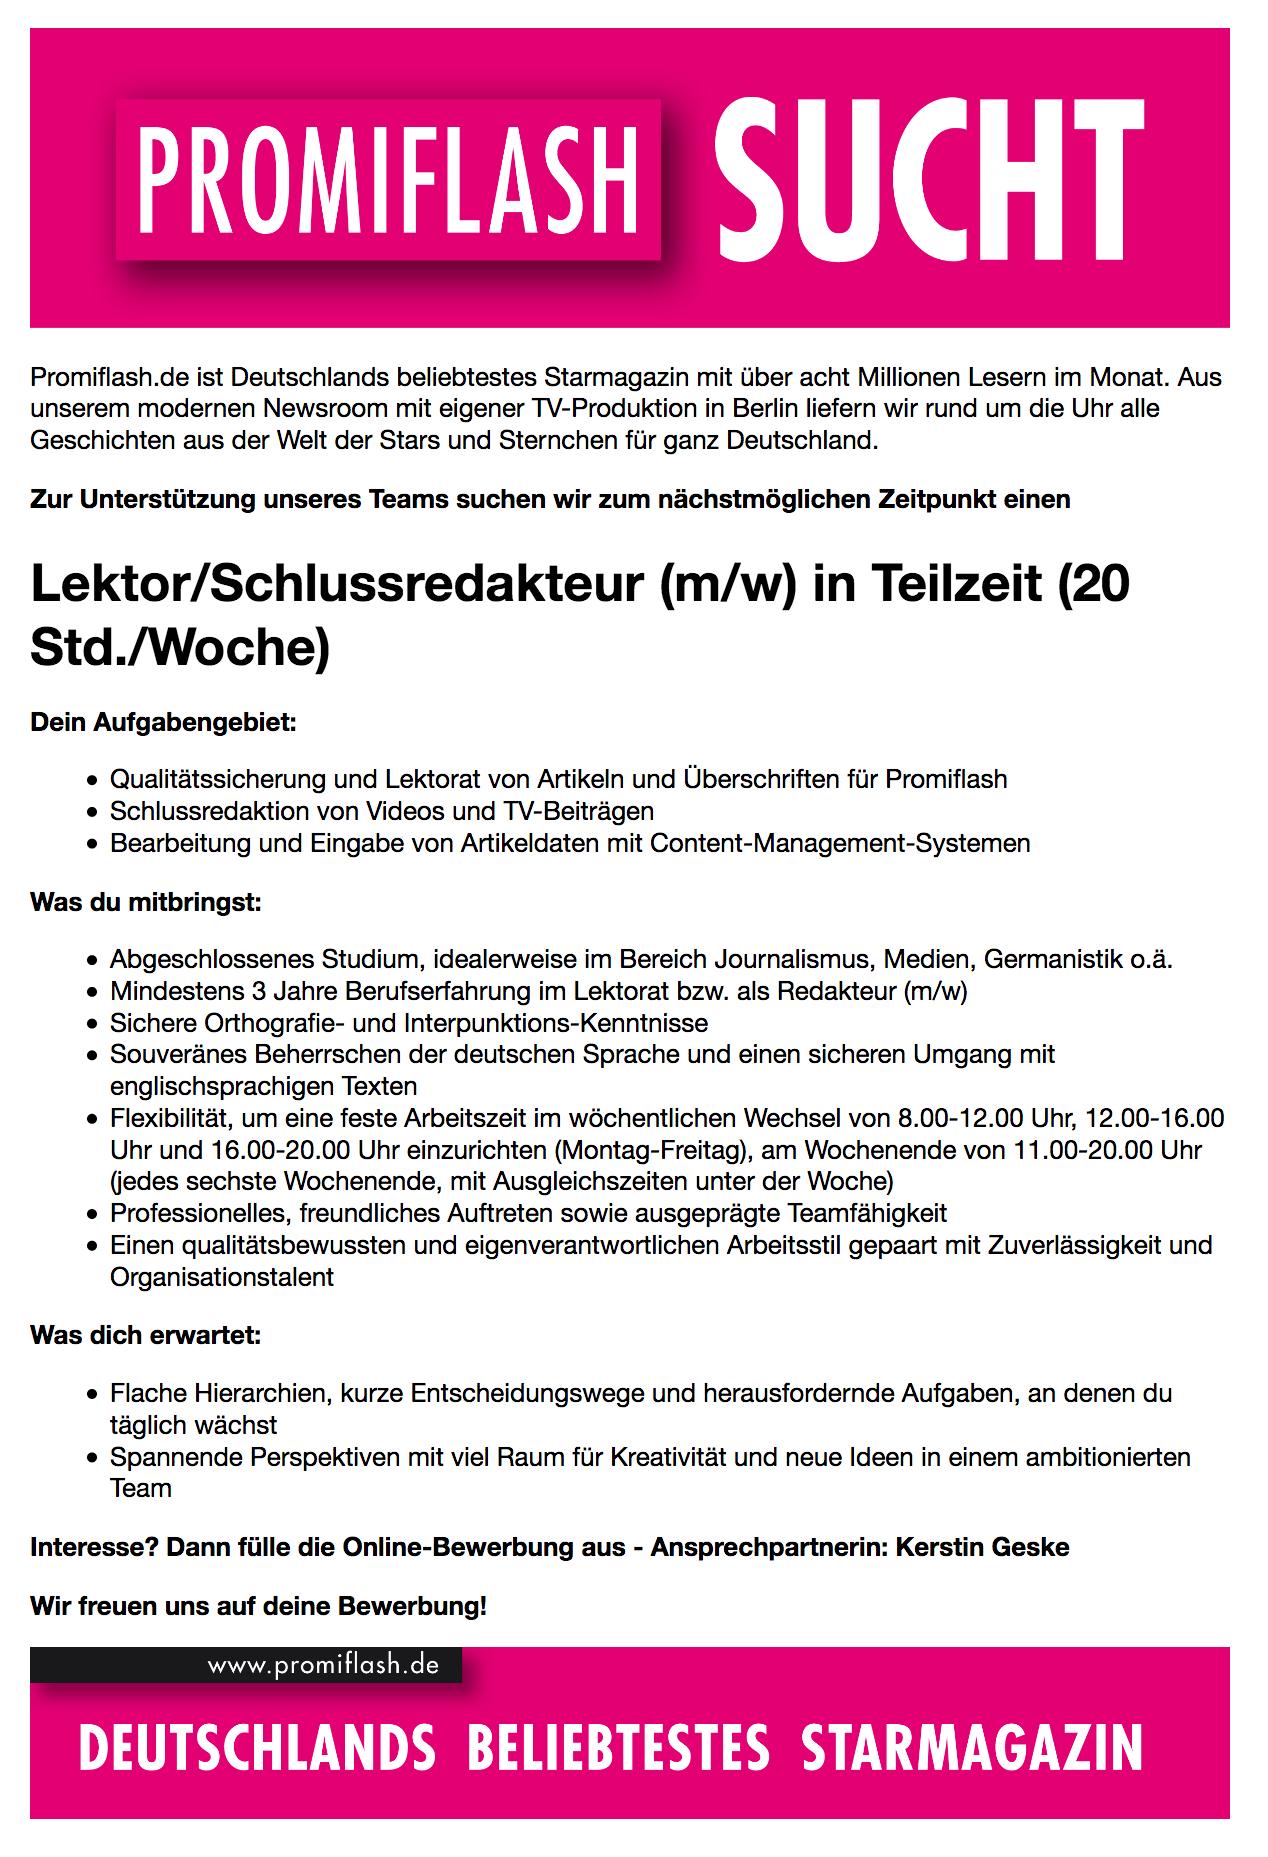 celebrity news ag berlin sucht lektor schlussredakteur in teilzeit m w jobb rse. Black Bedroom Furniture Sets. Home Design Ideas